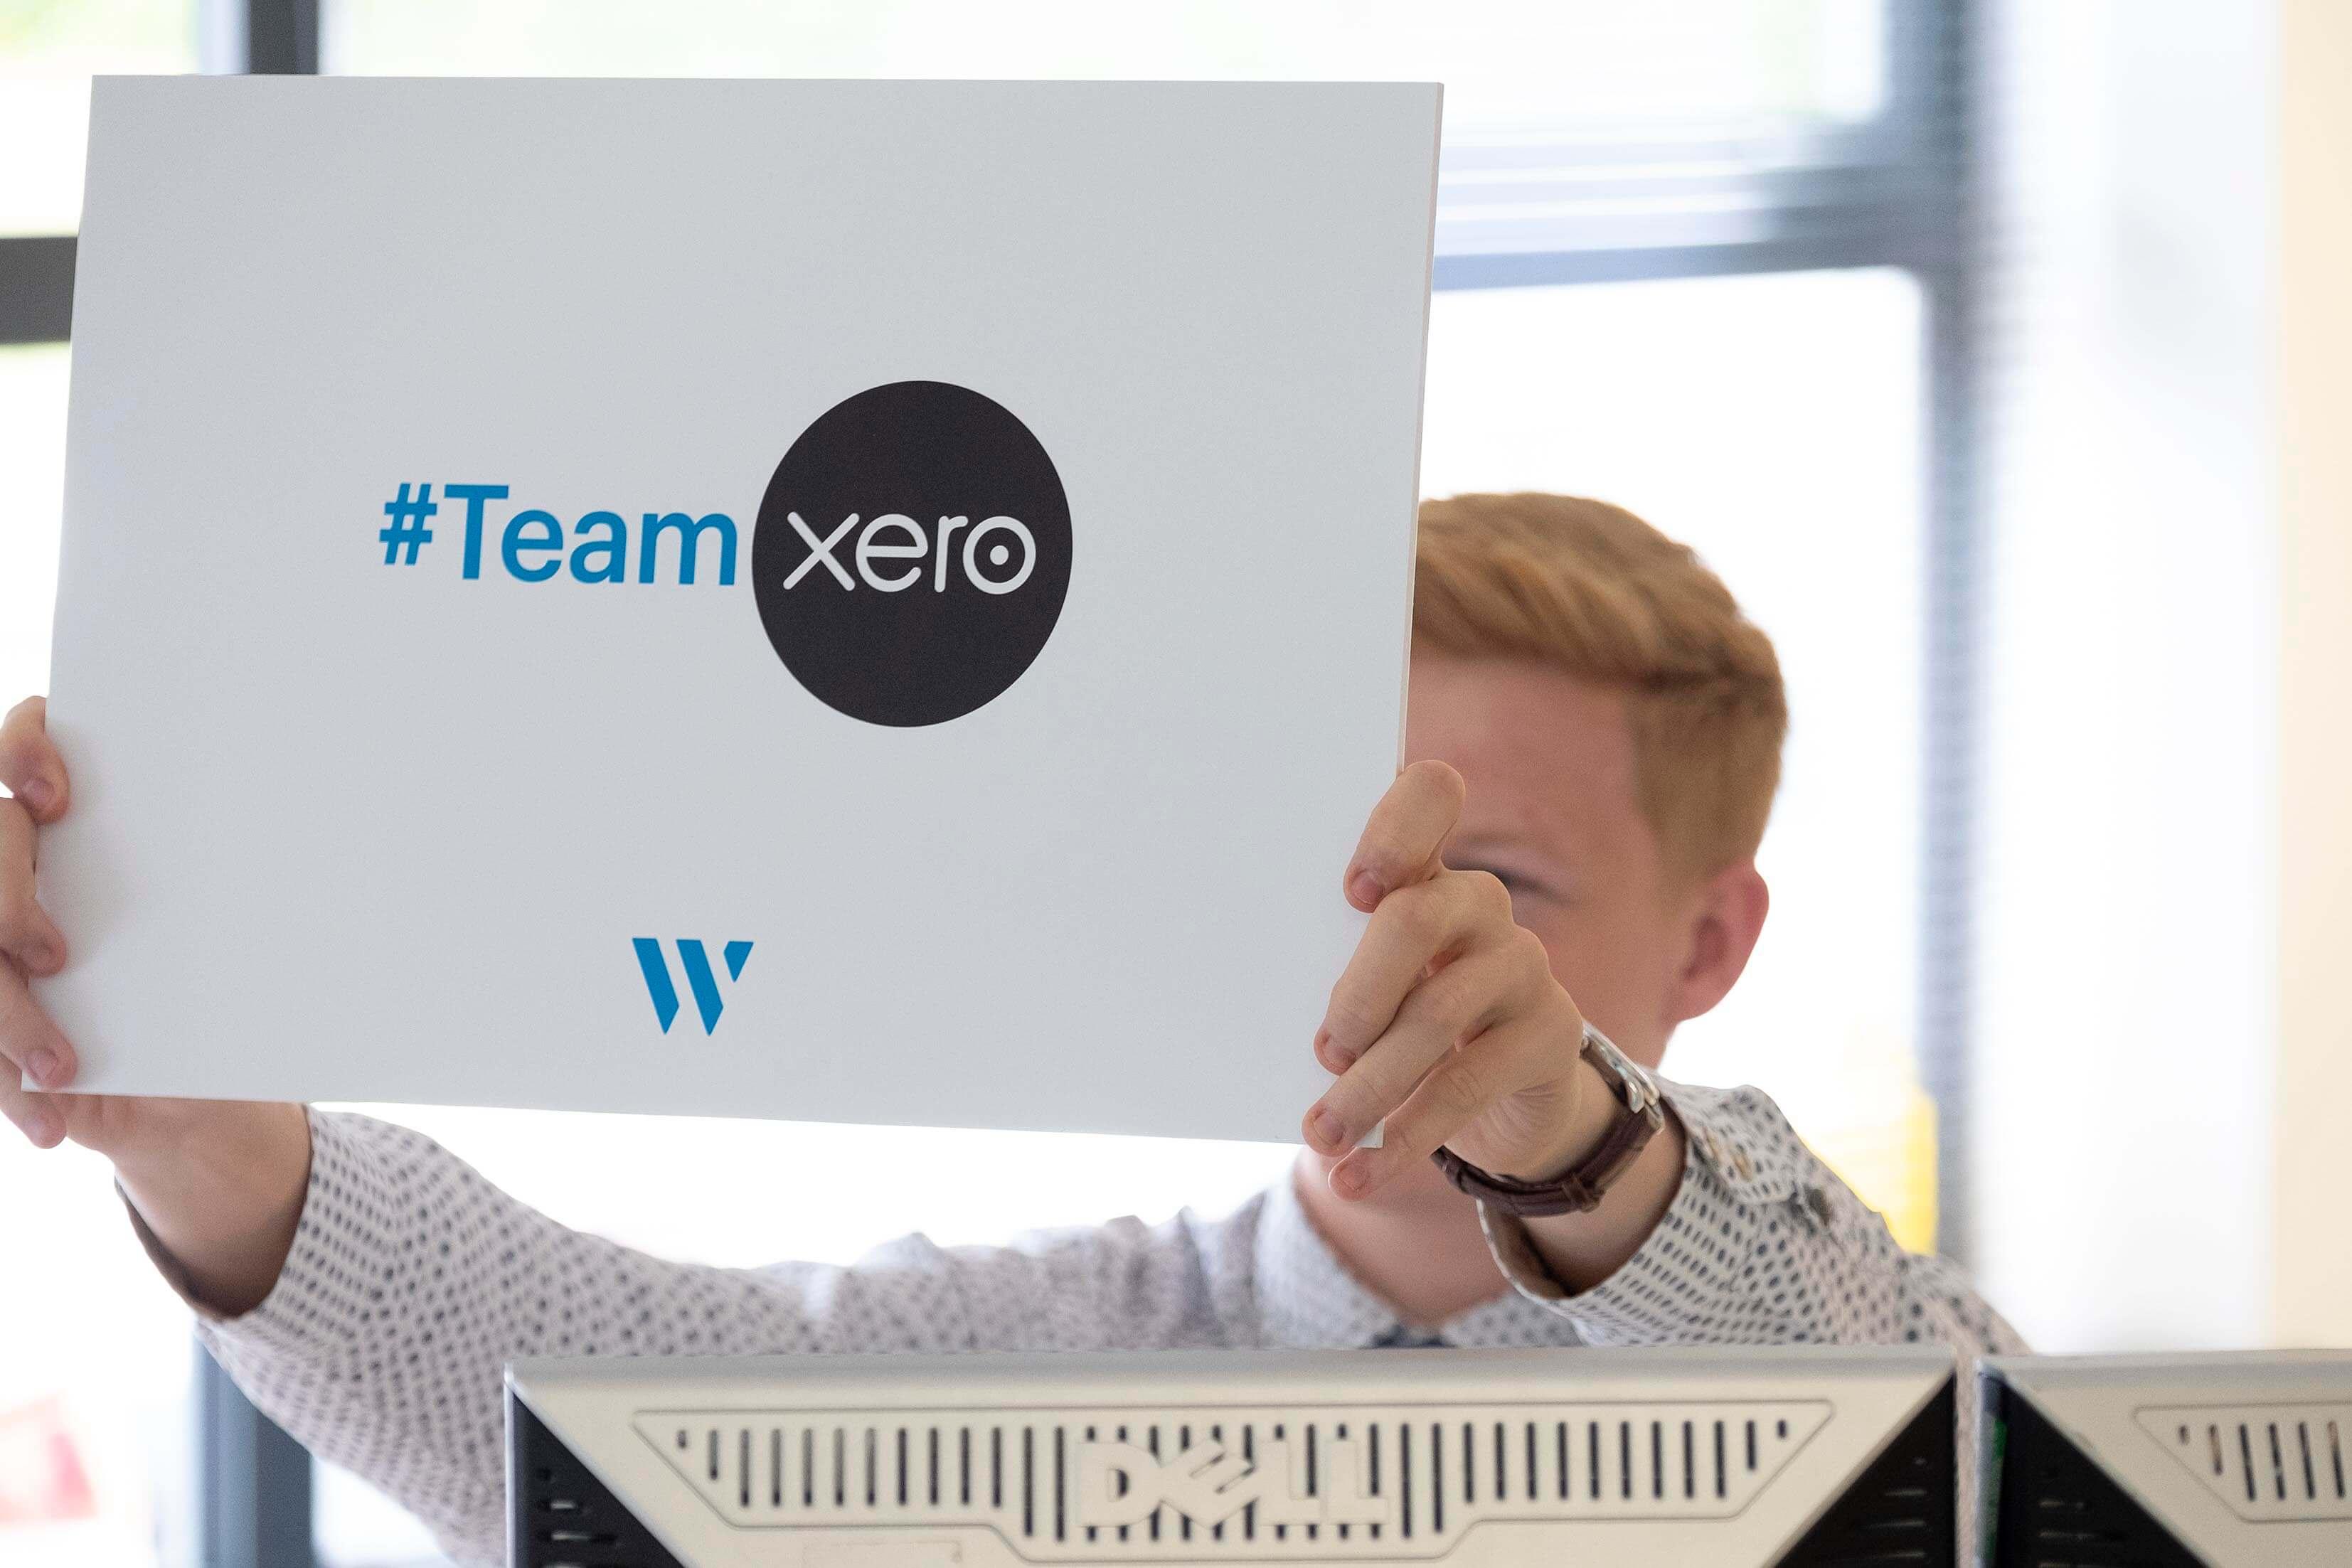 Team Xero